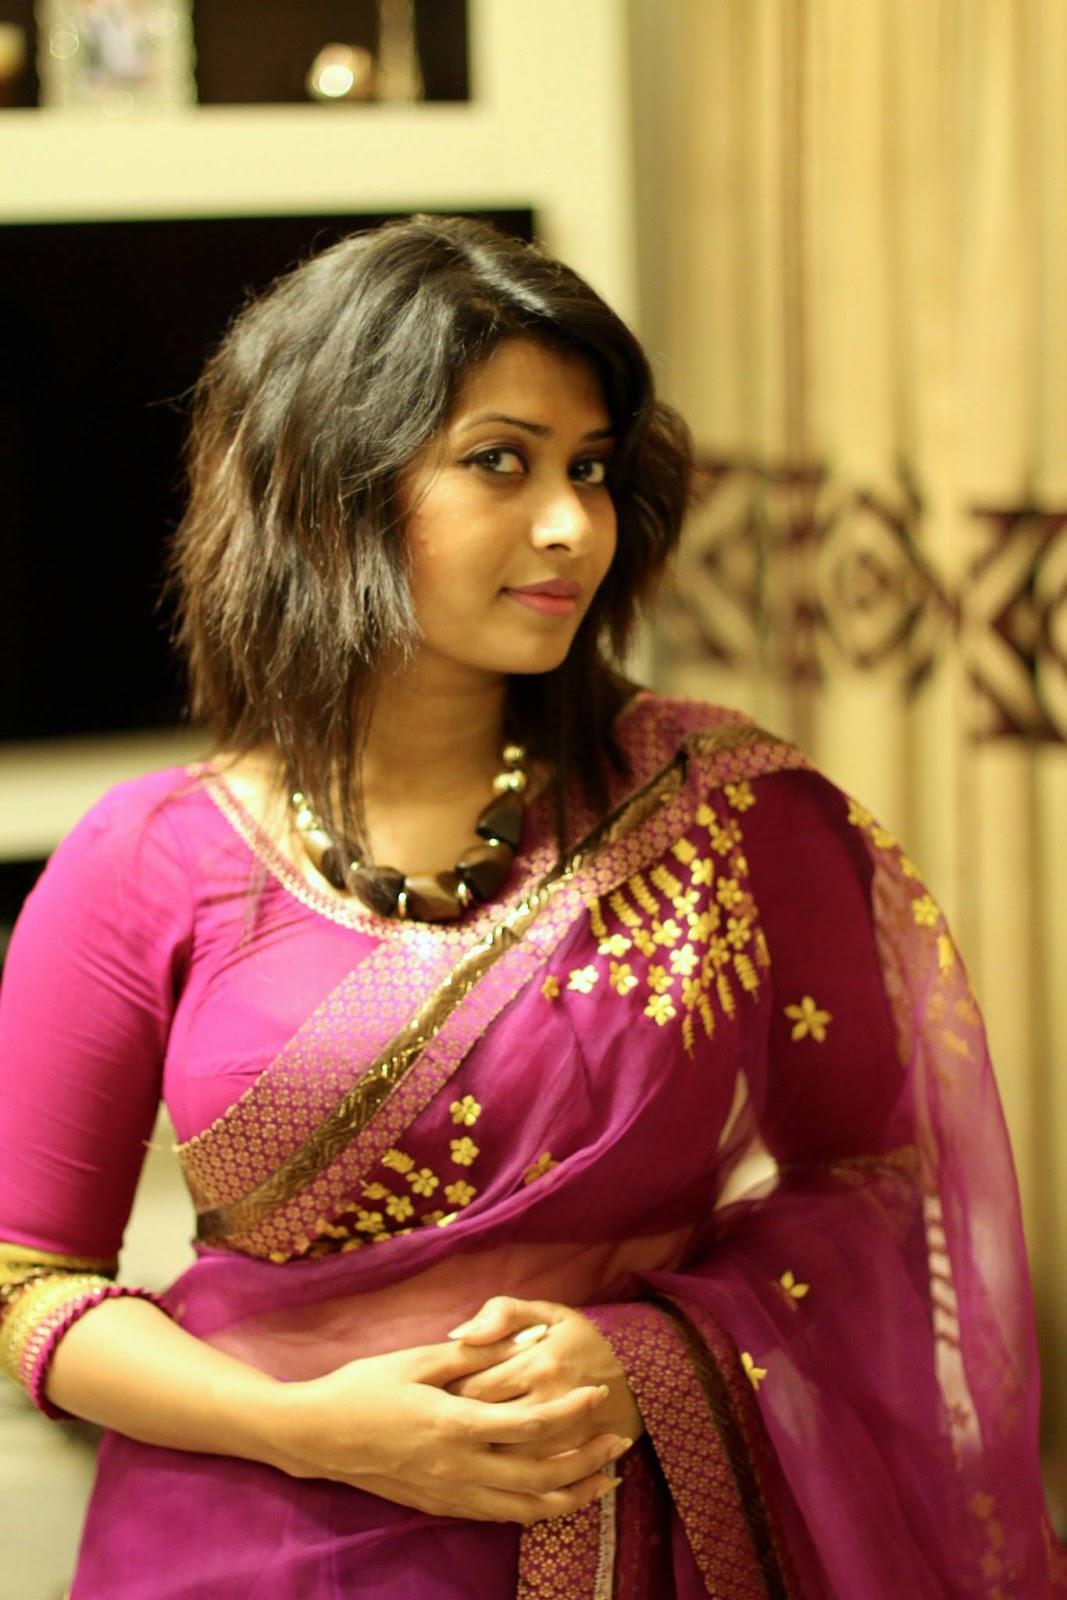 Andhra Telugu Women And Girls Numbers 2017-9741